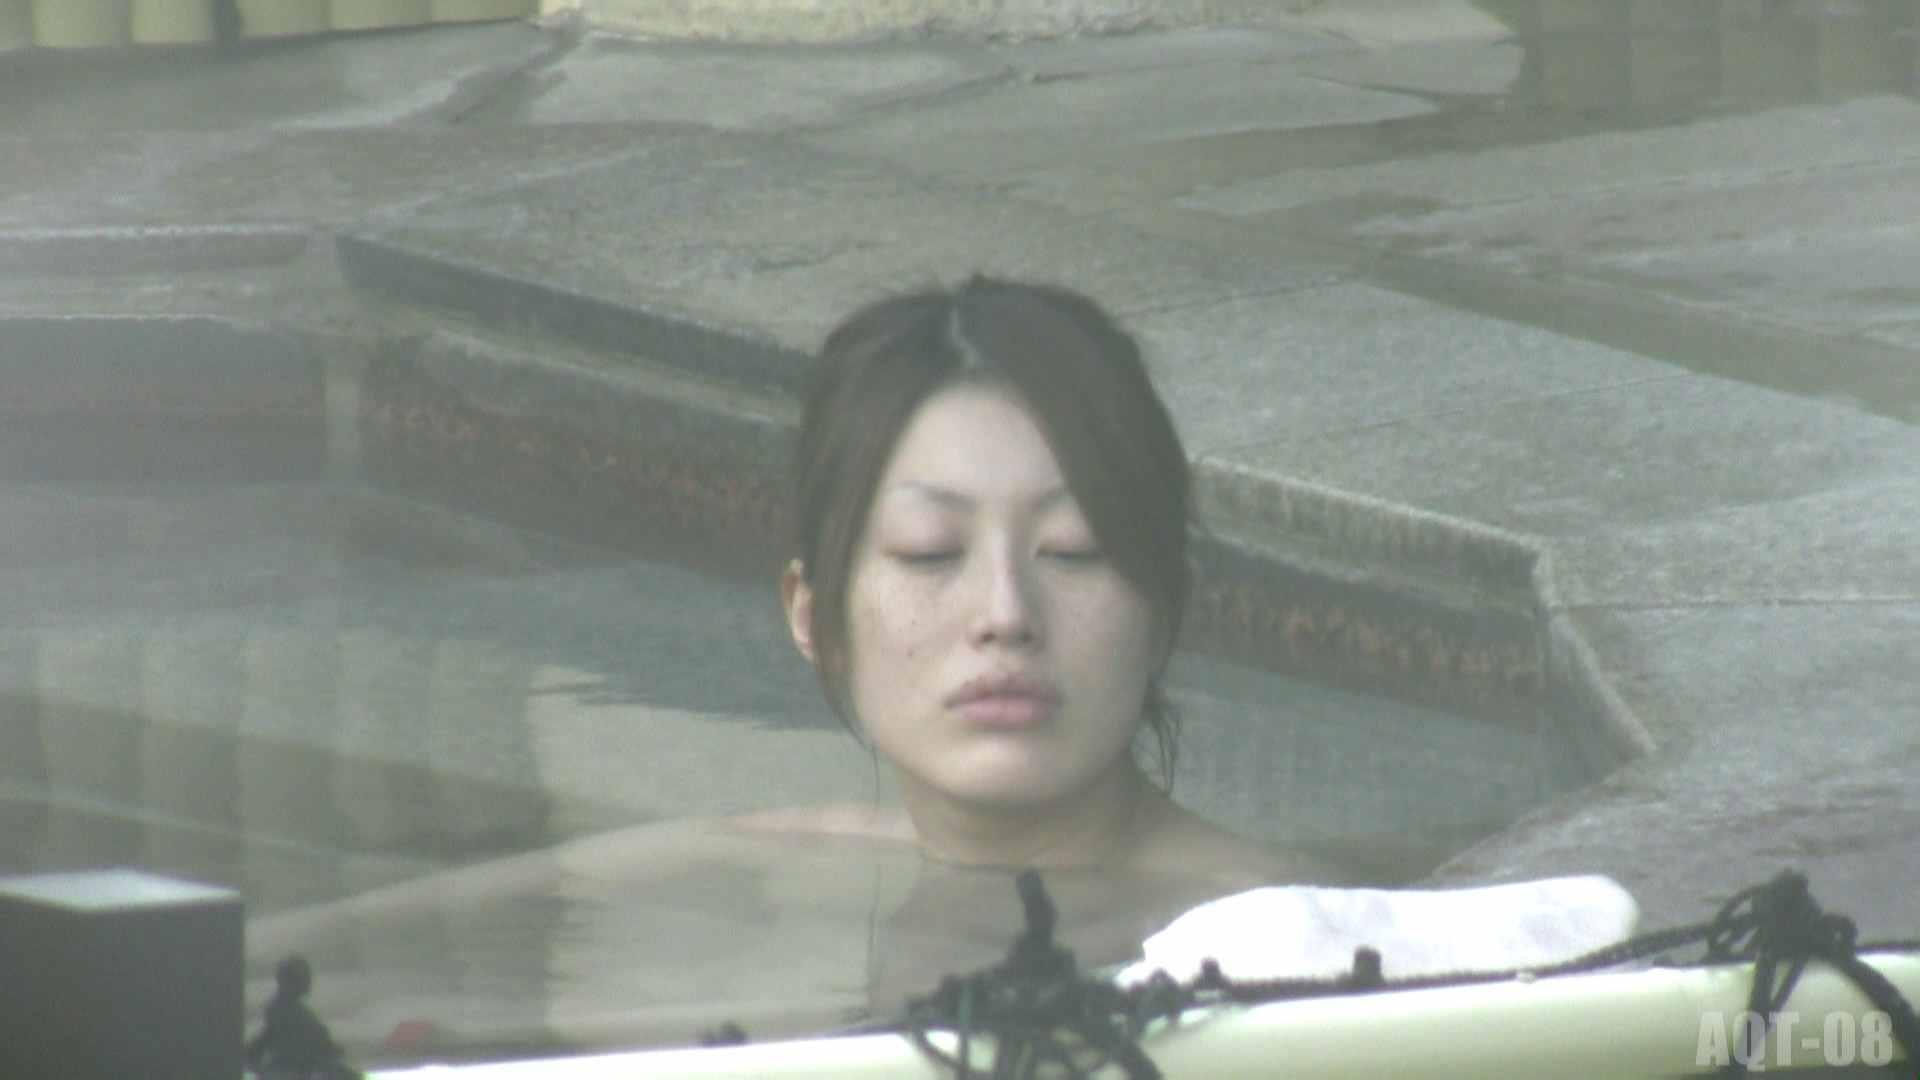 Aquaな露天風呂Vol.775 盗撮映像  74Pix 48